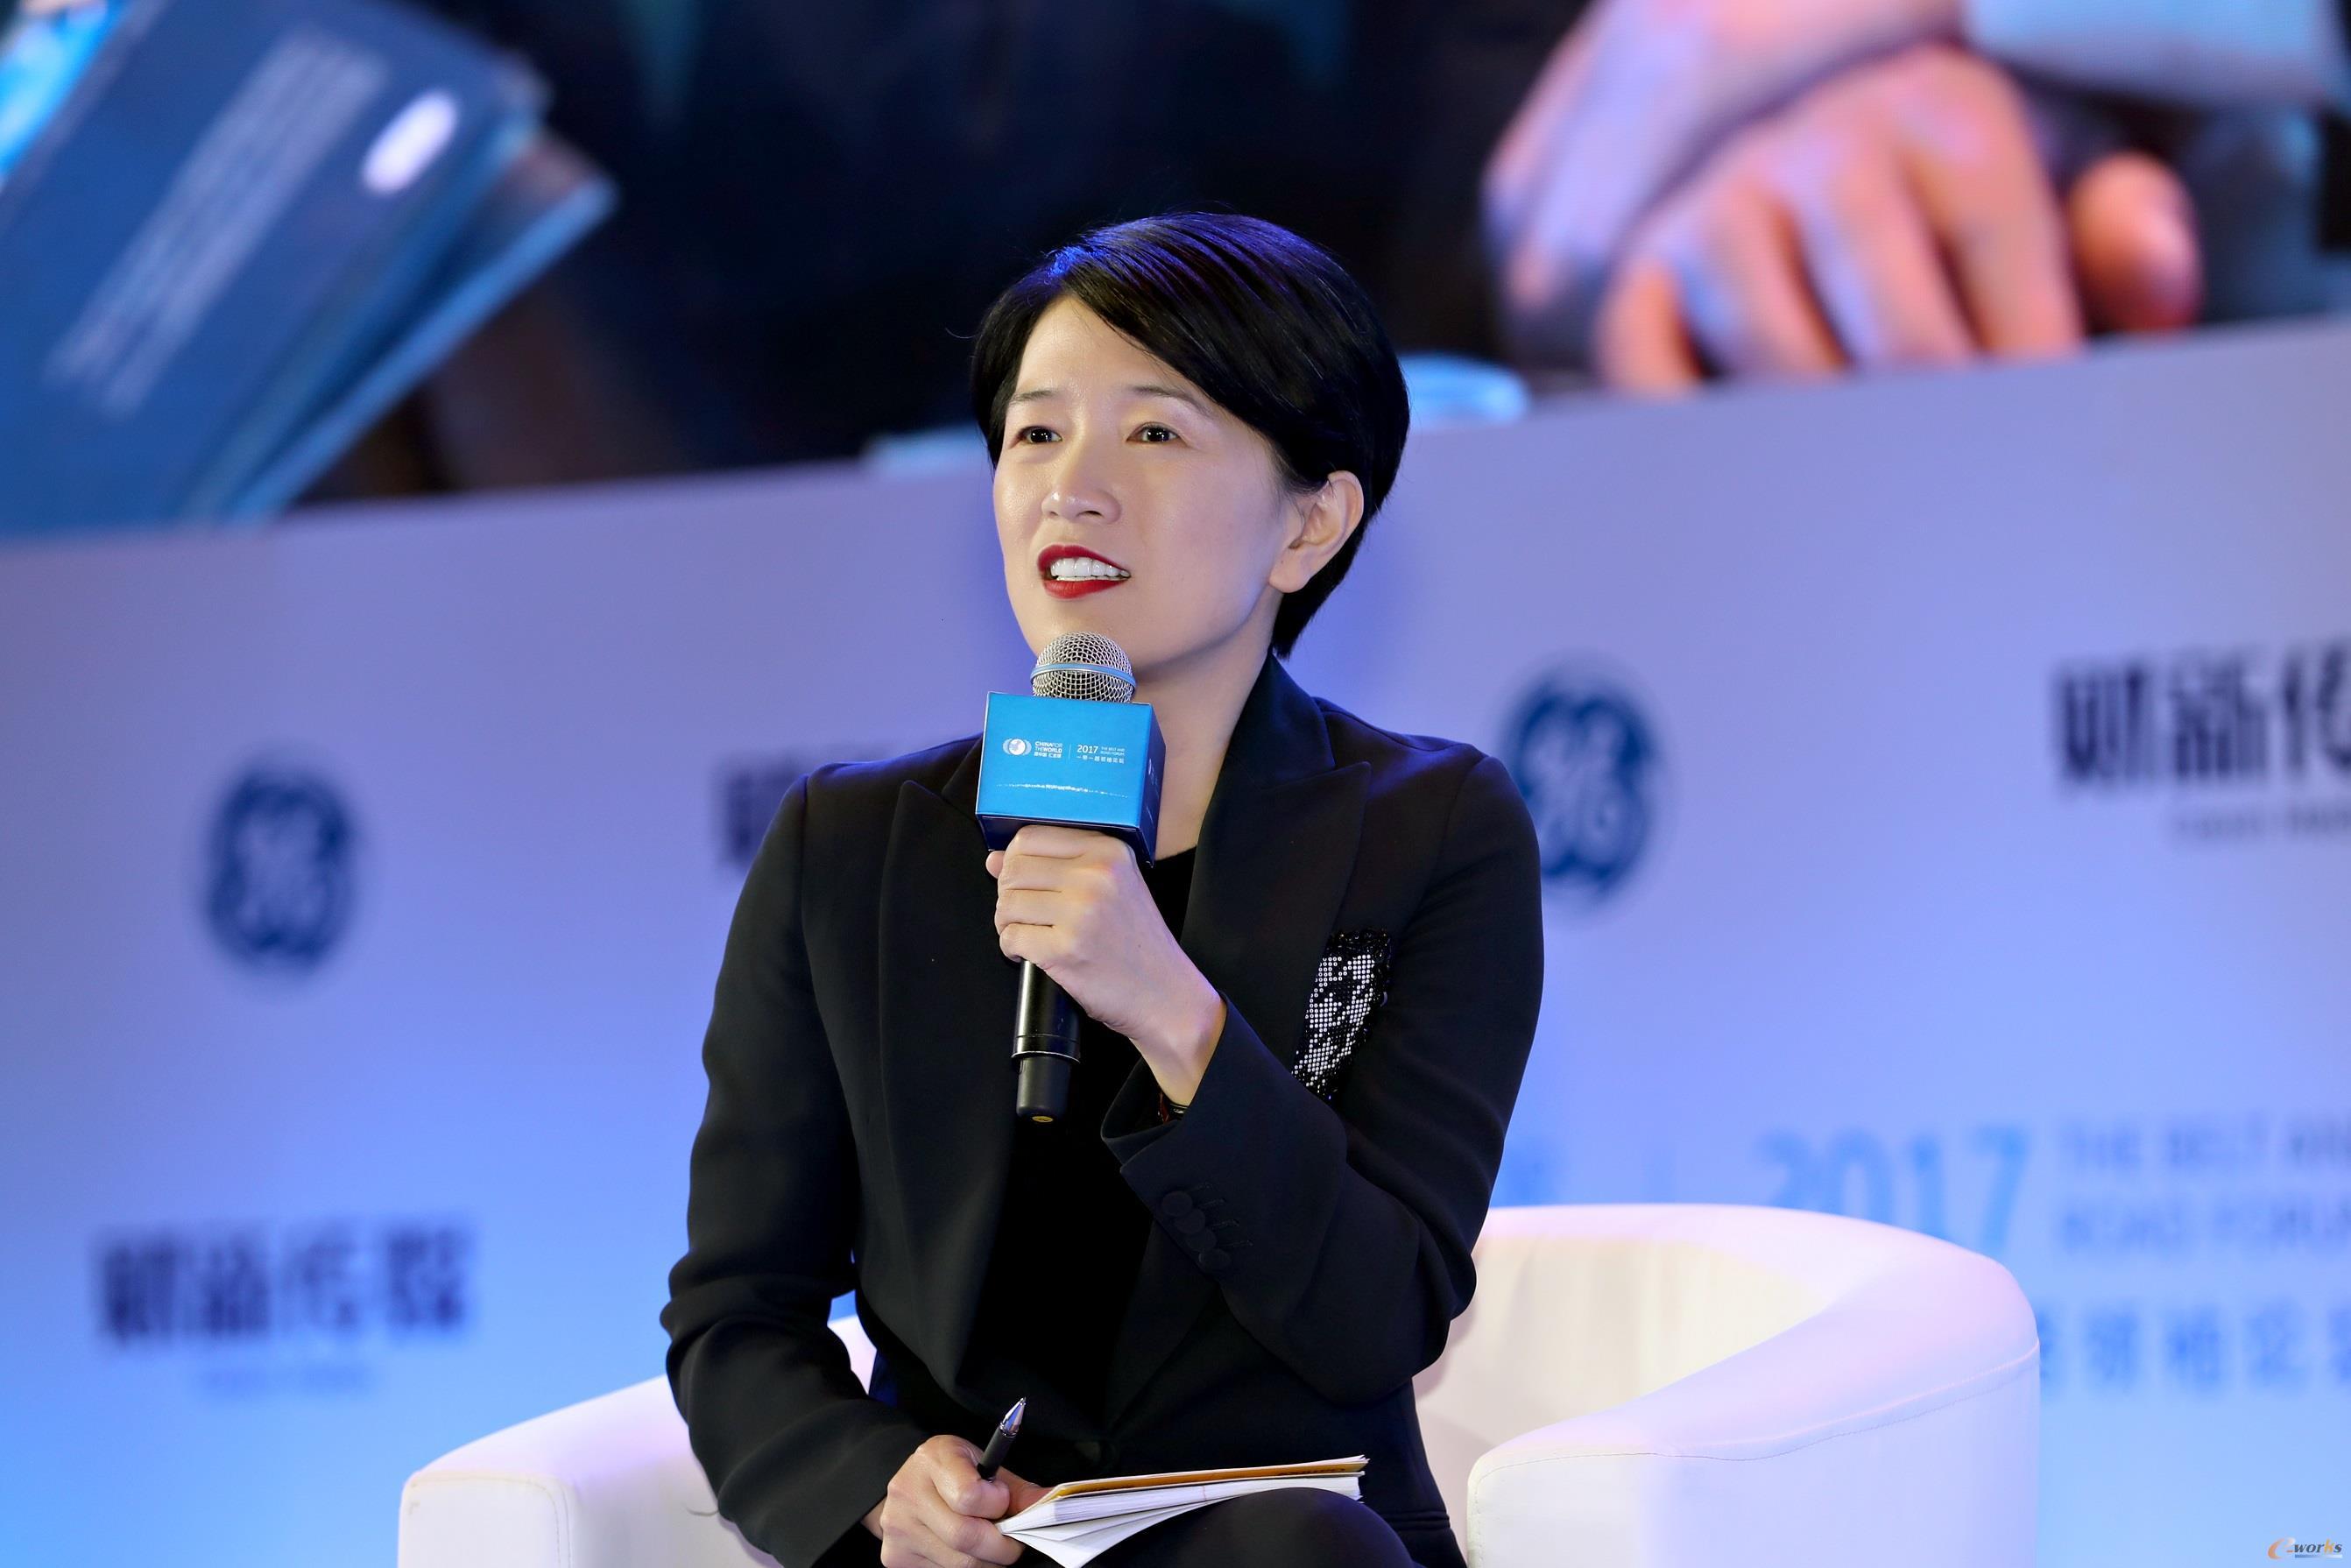 GE全球高级副总裁、GE中国总裁兼首席执行官段小缨